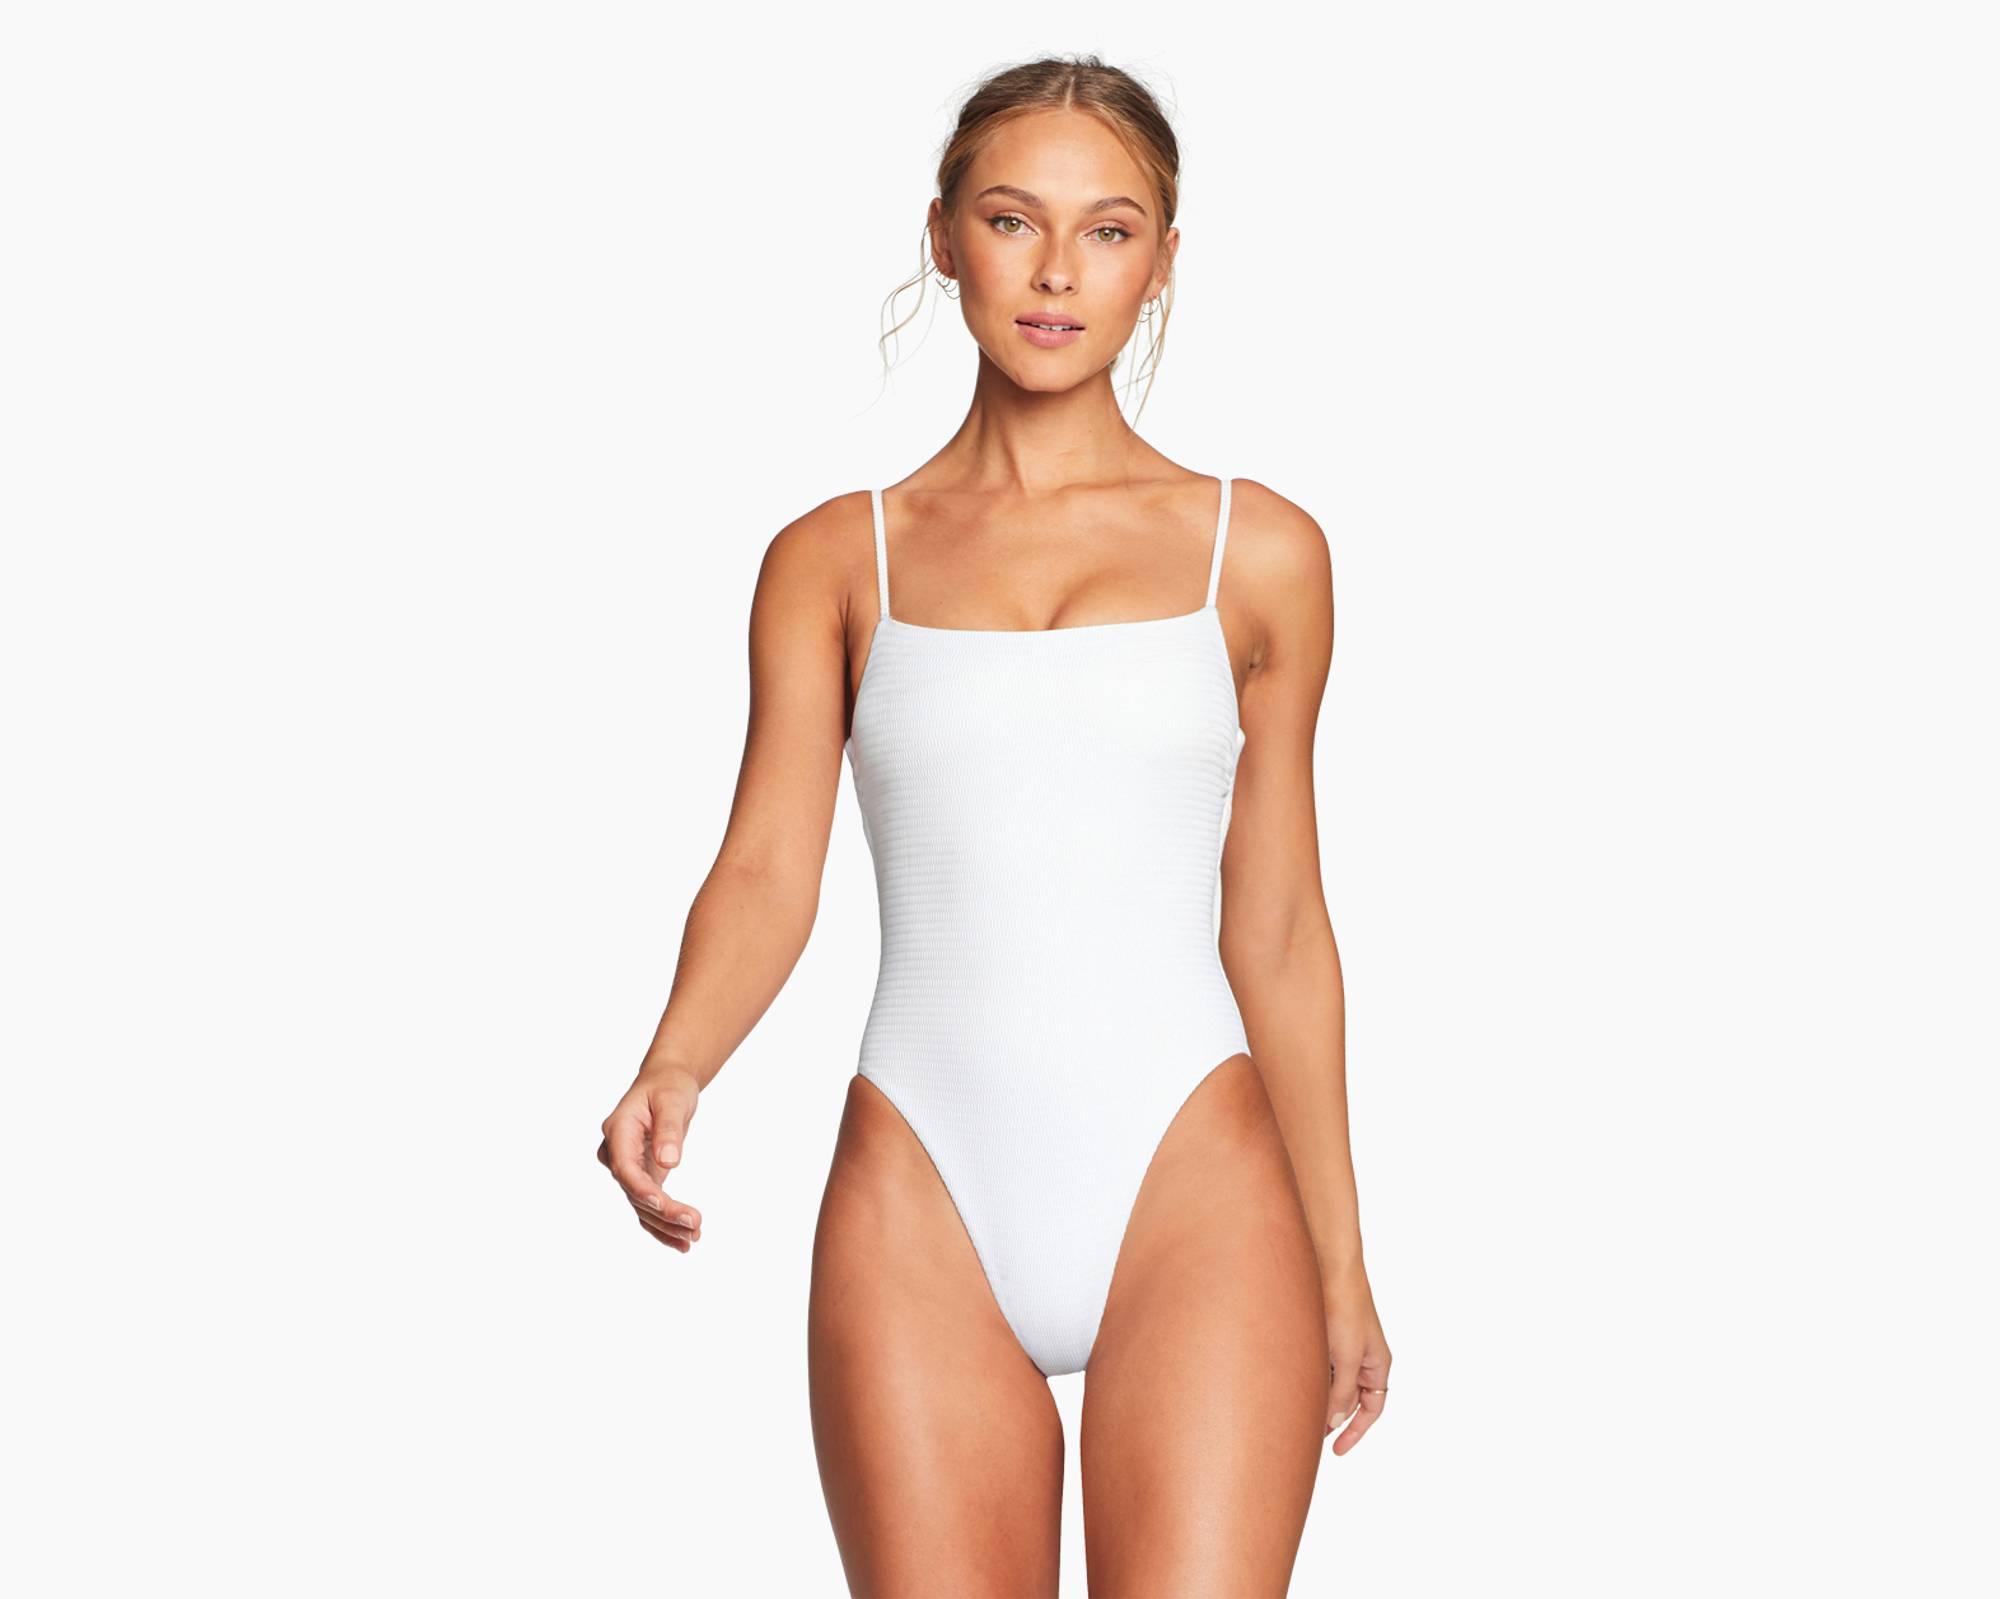 7. Jenna One Piece - Vitamin A